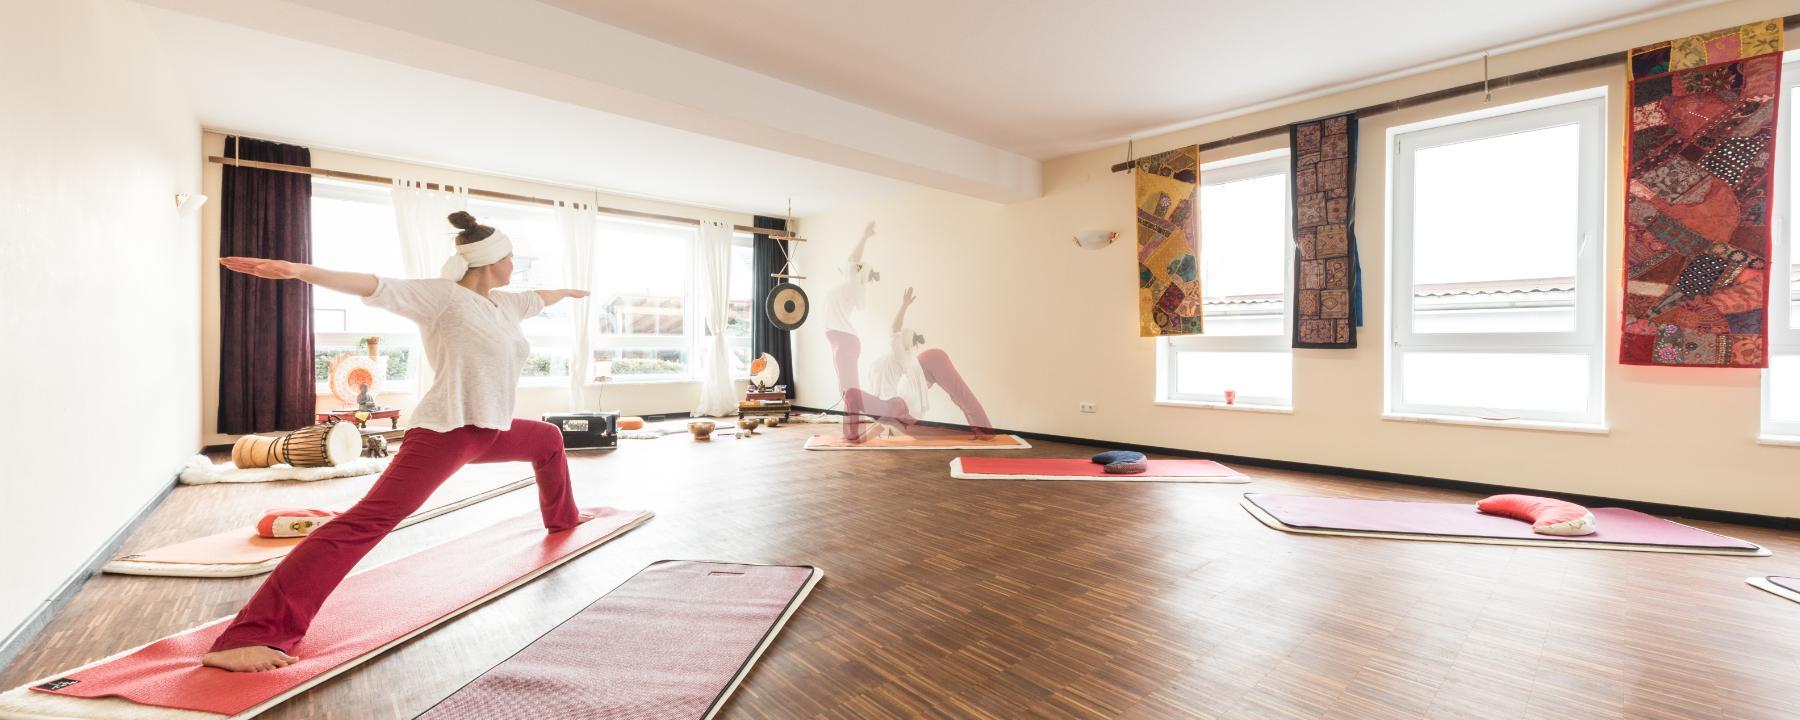 Foto de Hotel Bayernwinkel - Yoga & Ayurveda